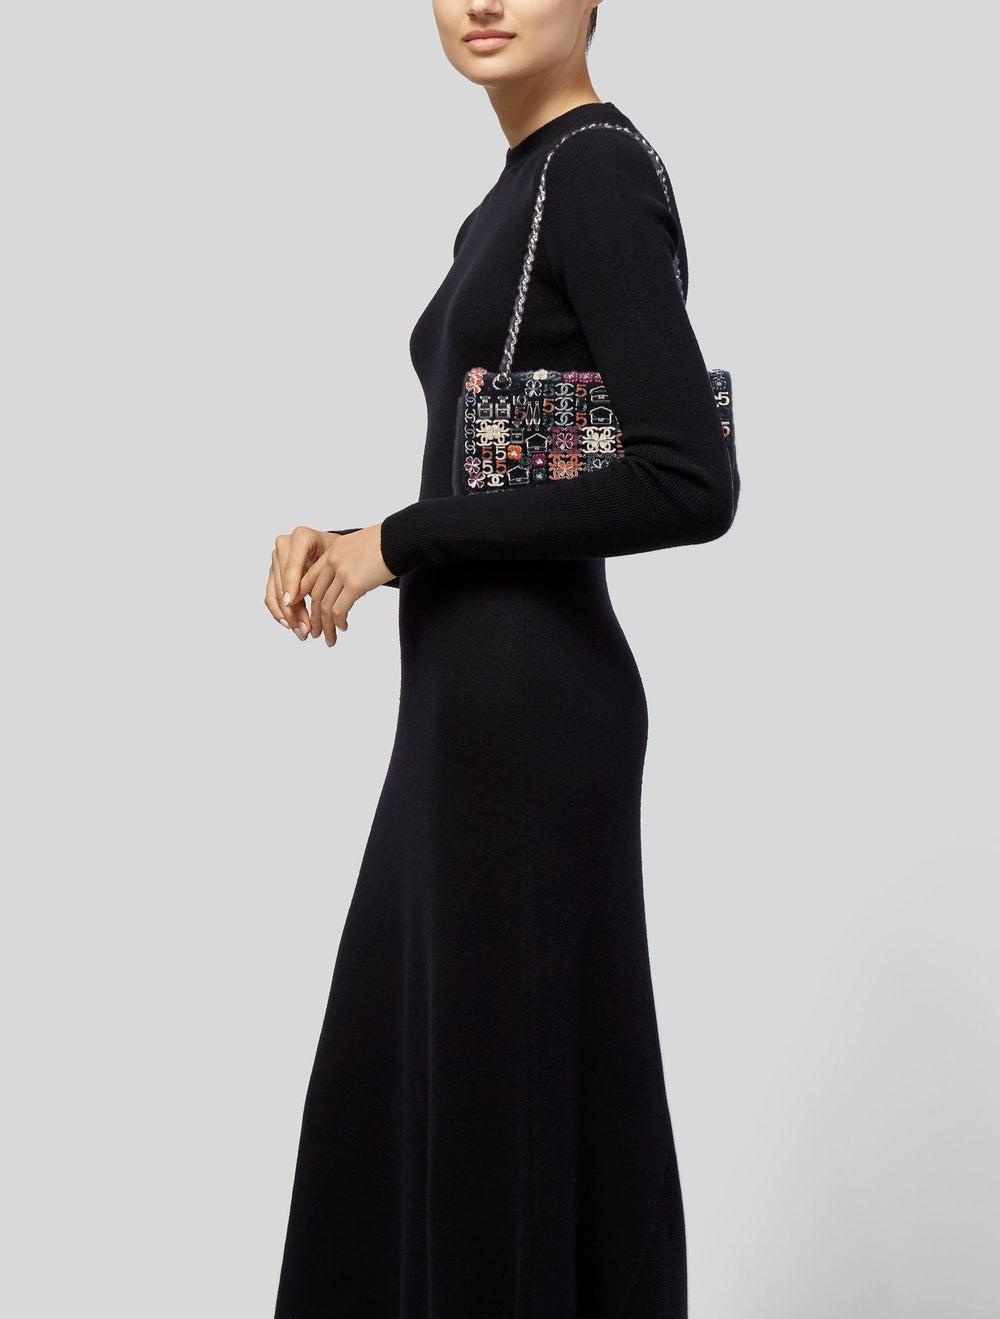 Chanel Enamel Jeweled Tweed Flap Bag Black - image 2